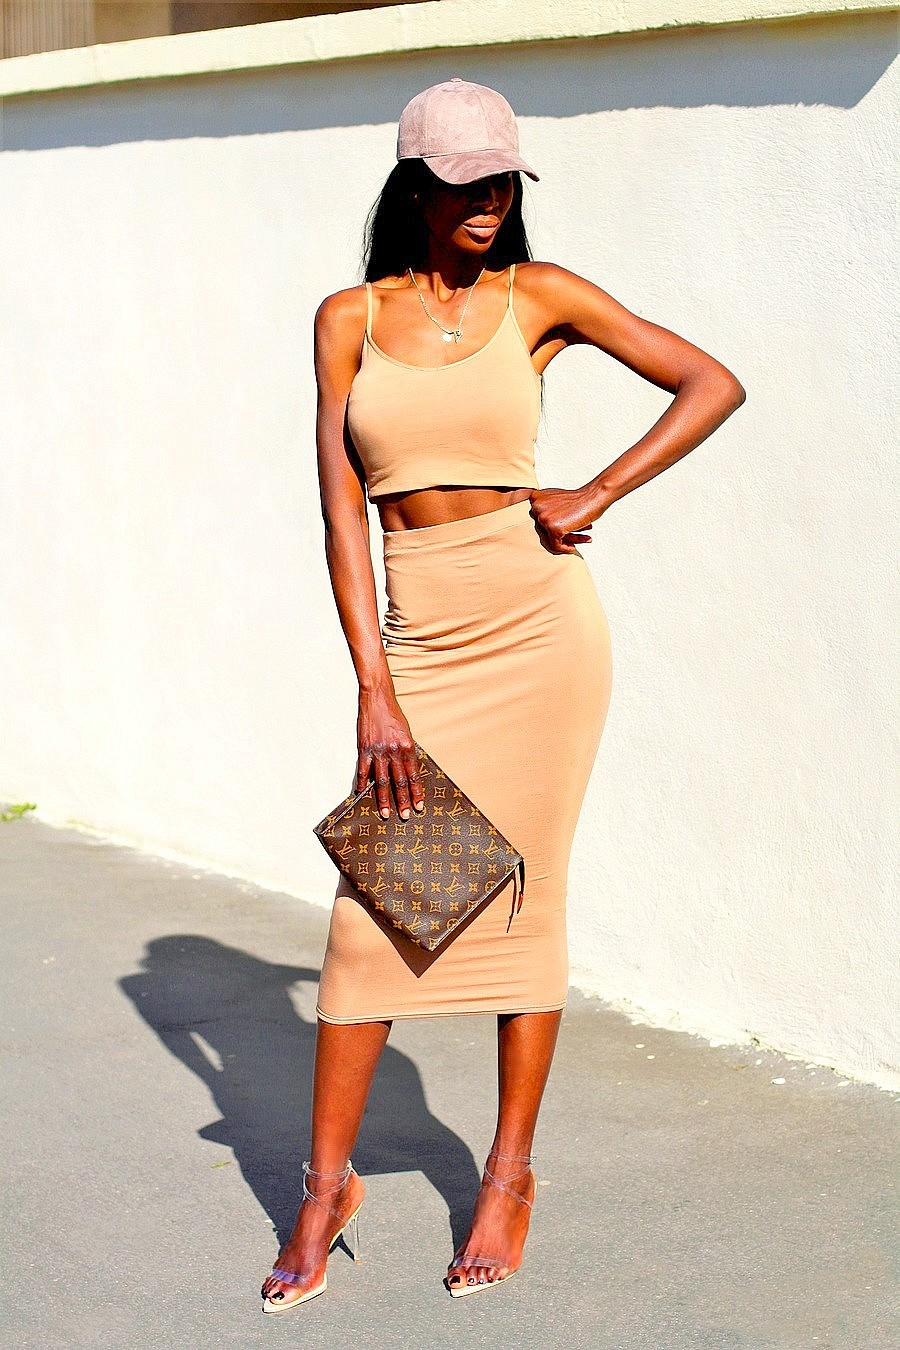 tendance-chaussures-transparentes-yeezy-kim-kardashian